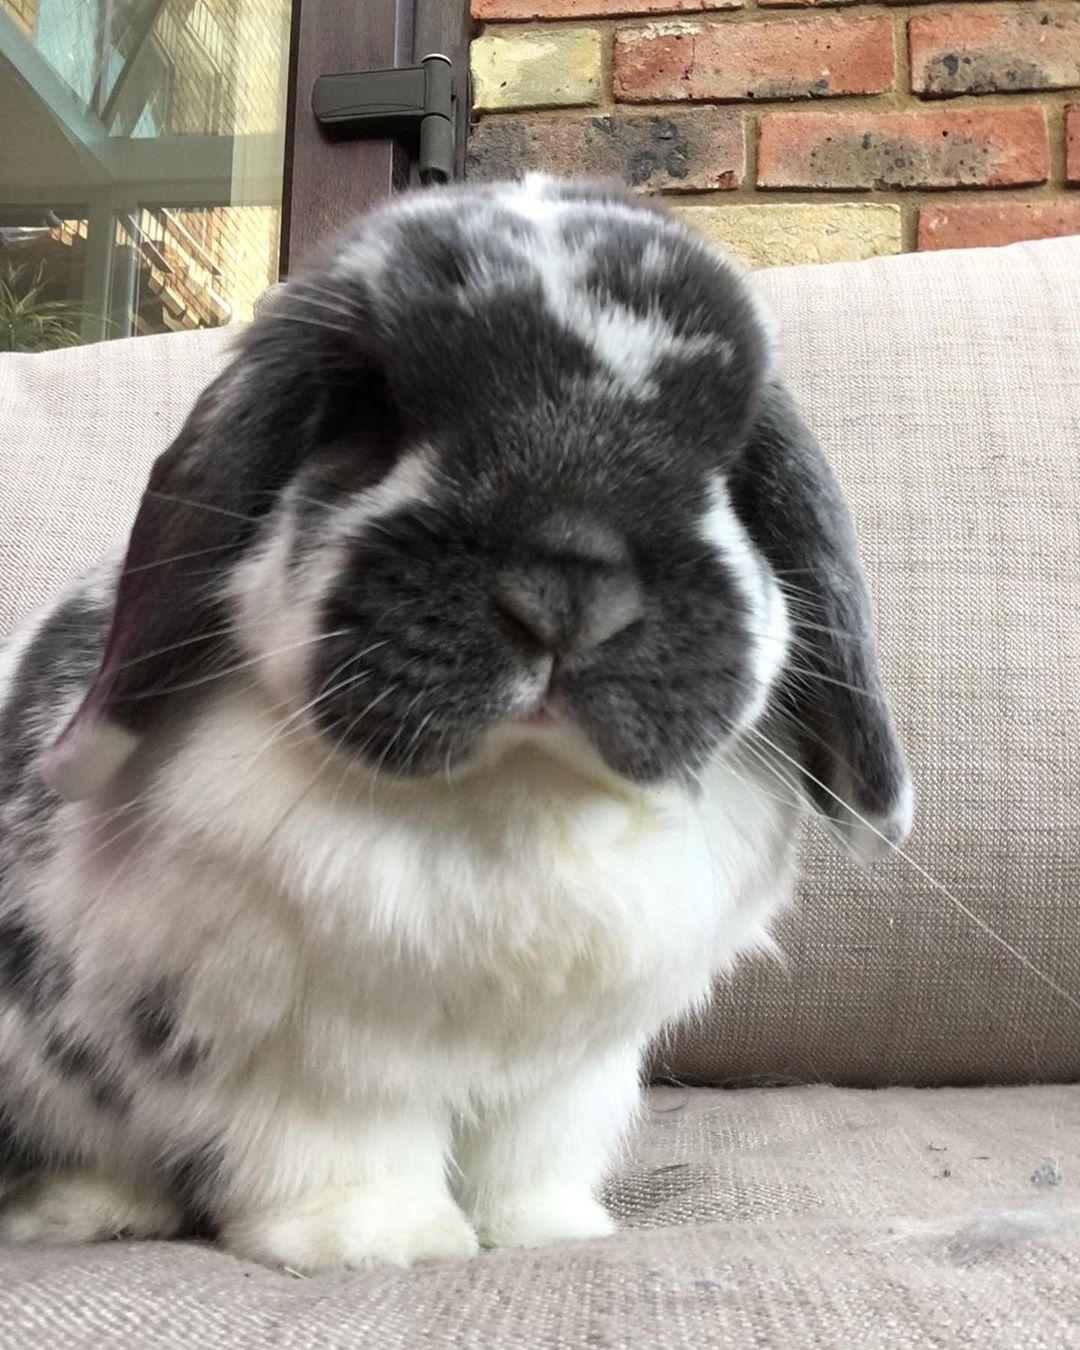 Pinterest Ijackson666 Pet Bunny Cute Bunny Pictures Cute Baby Bunnies